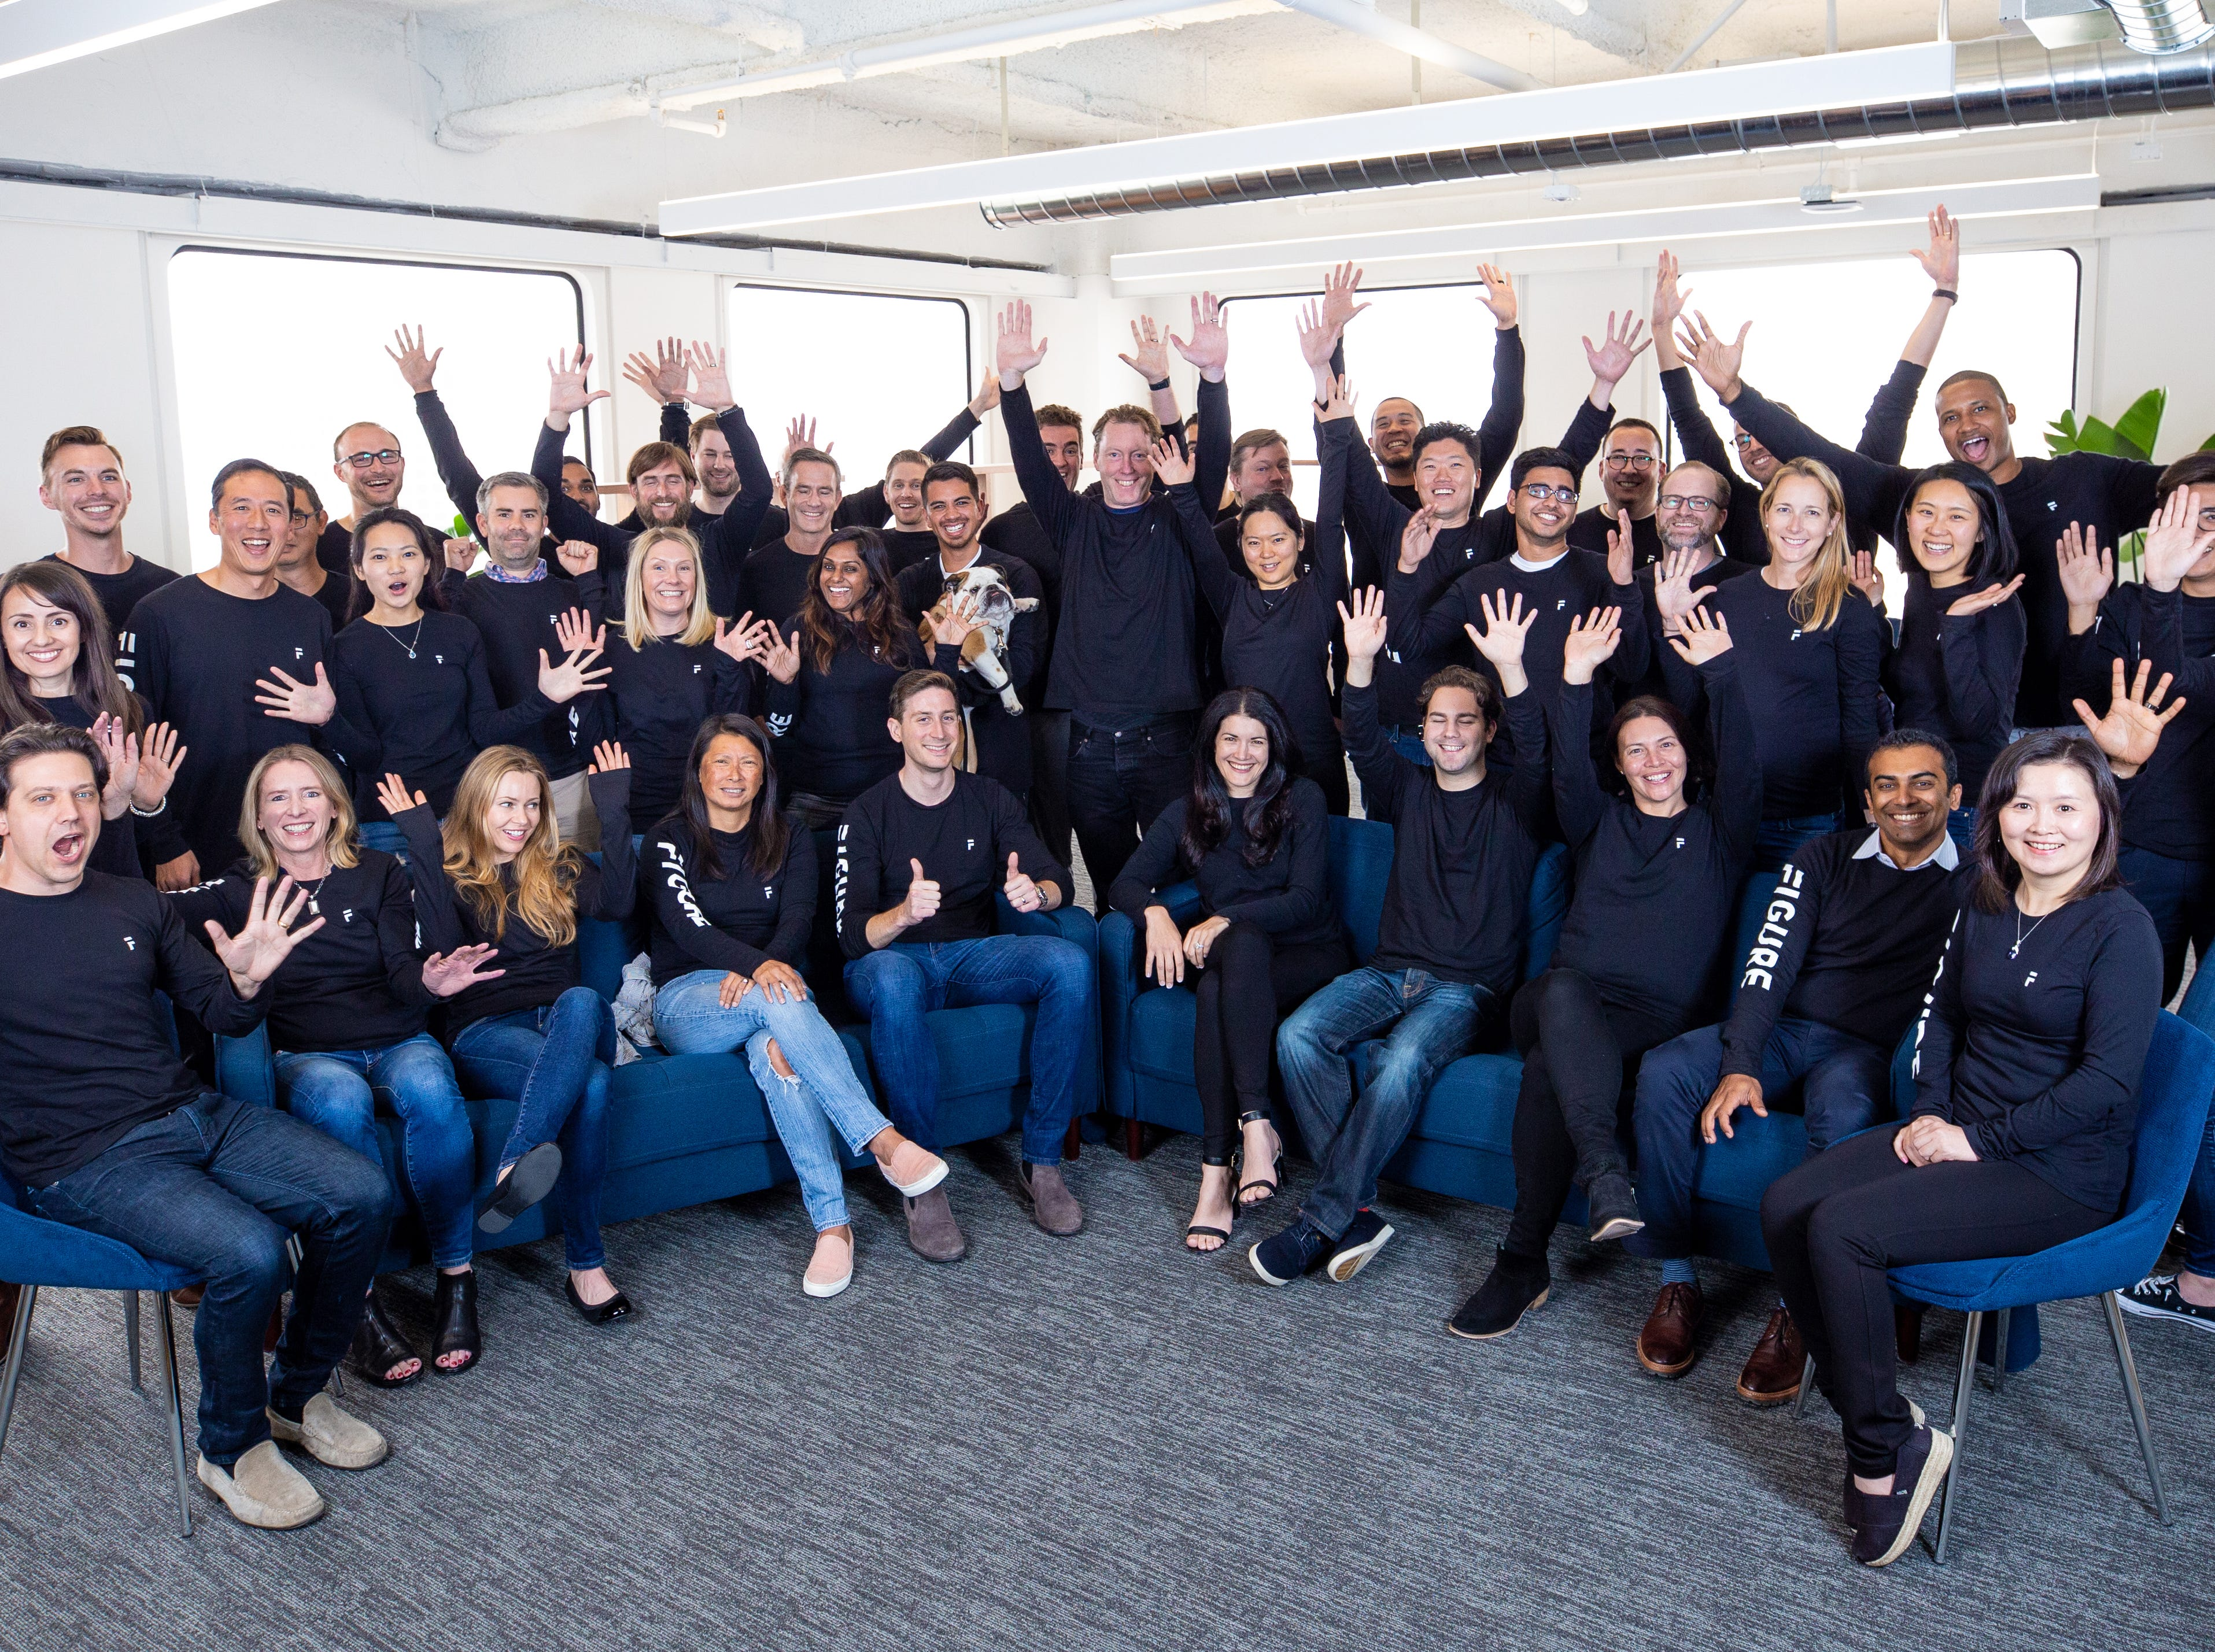 Bay Area finance tech company Figure Technologies expanding to Reno, creating 240 jobs